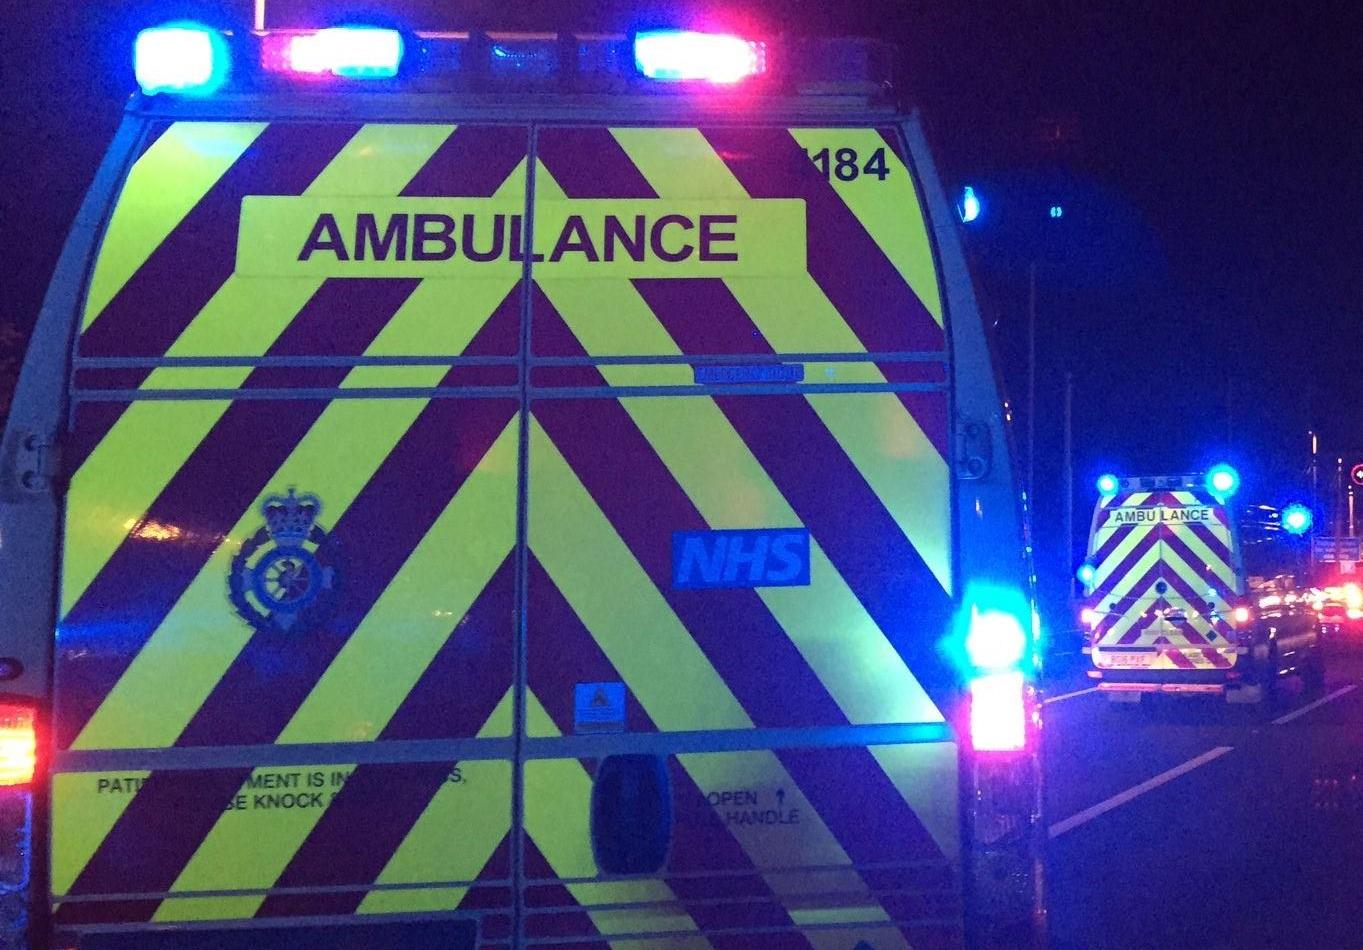 Night - Ambulances on motorway